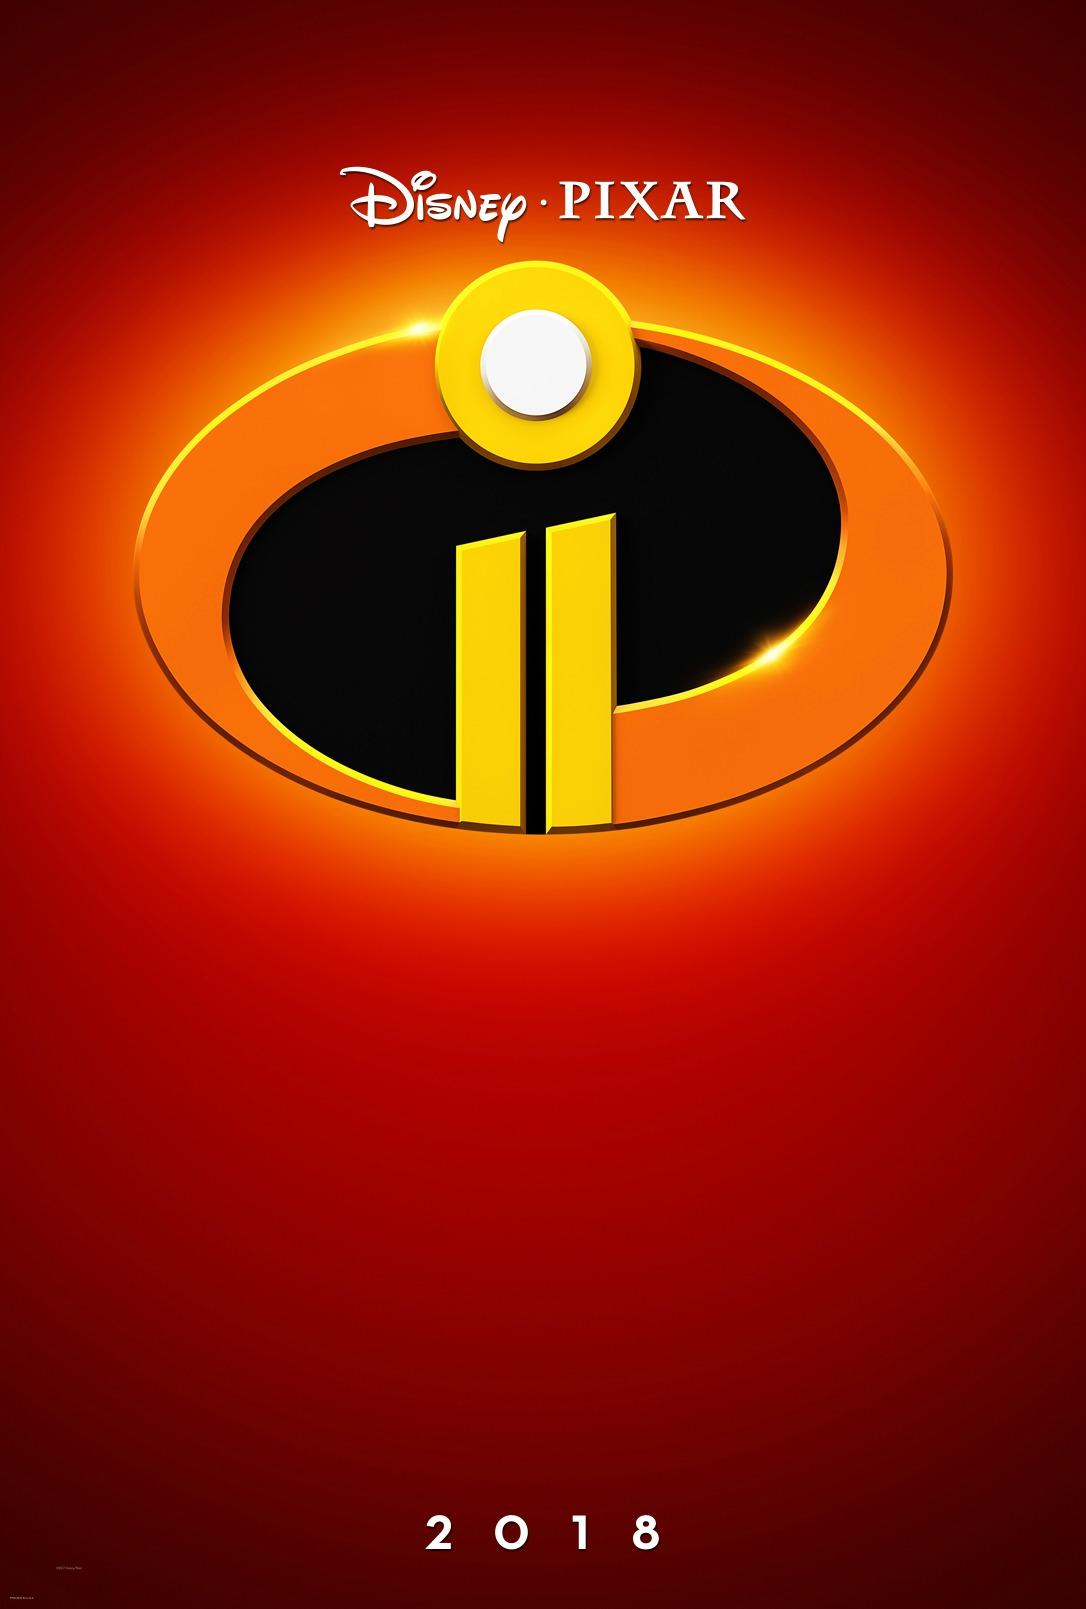 Disney•Pixar's INCREDIBLES 2 - New Teaser Trailer & Poster